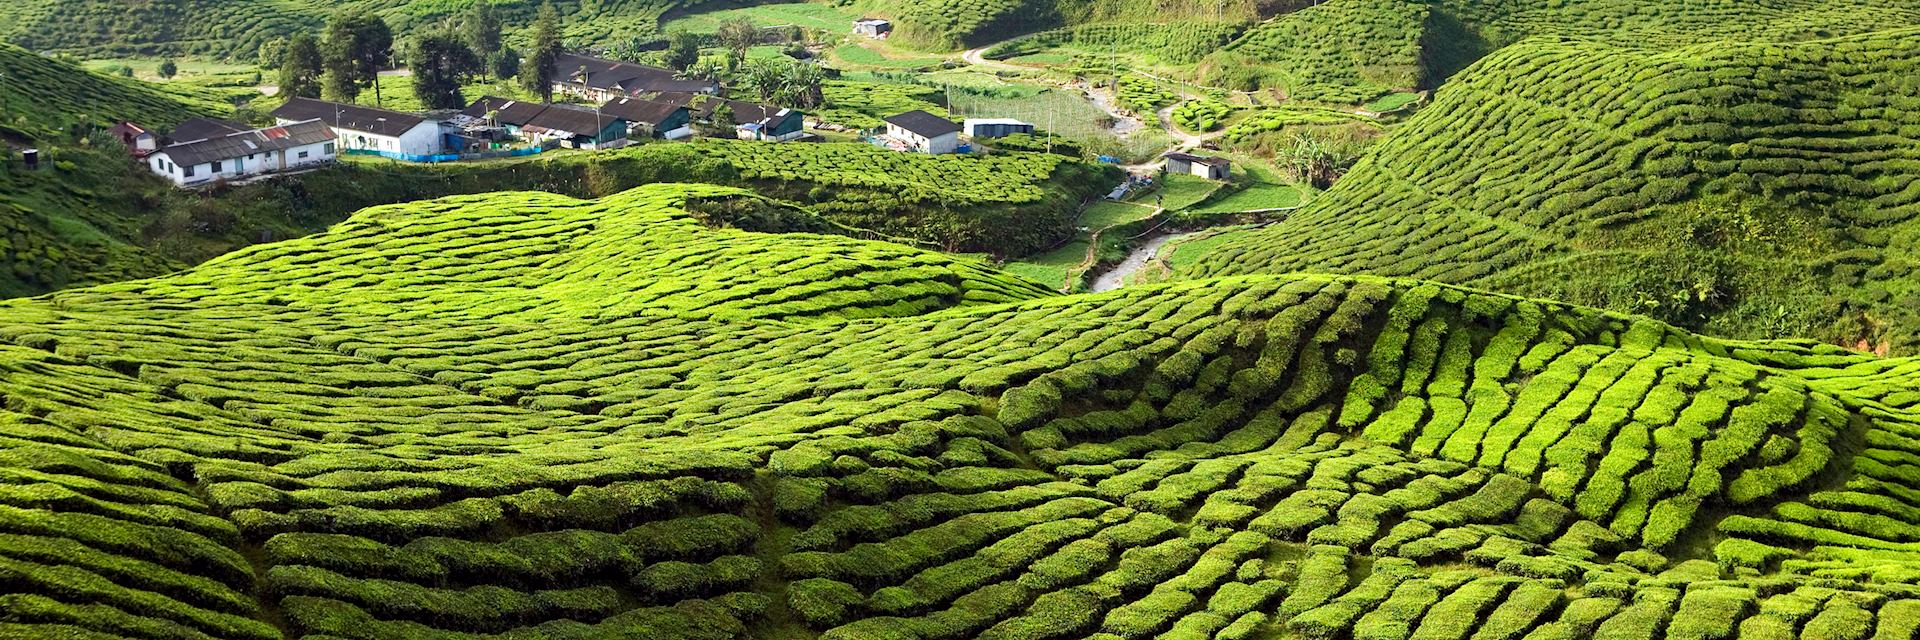 Tea plantations in the Cameron Highlands, Malaysia